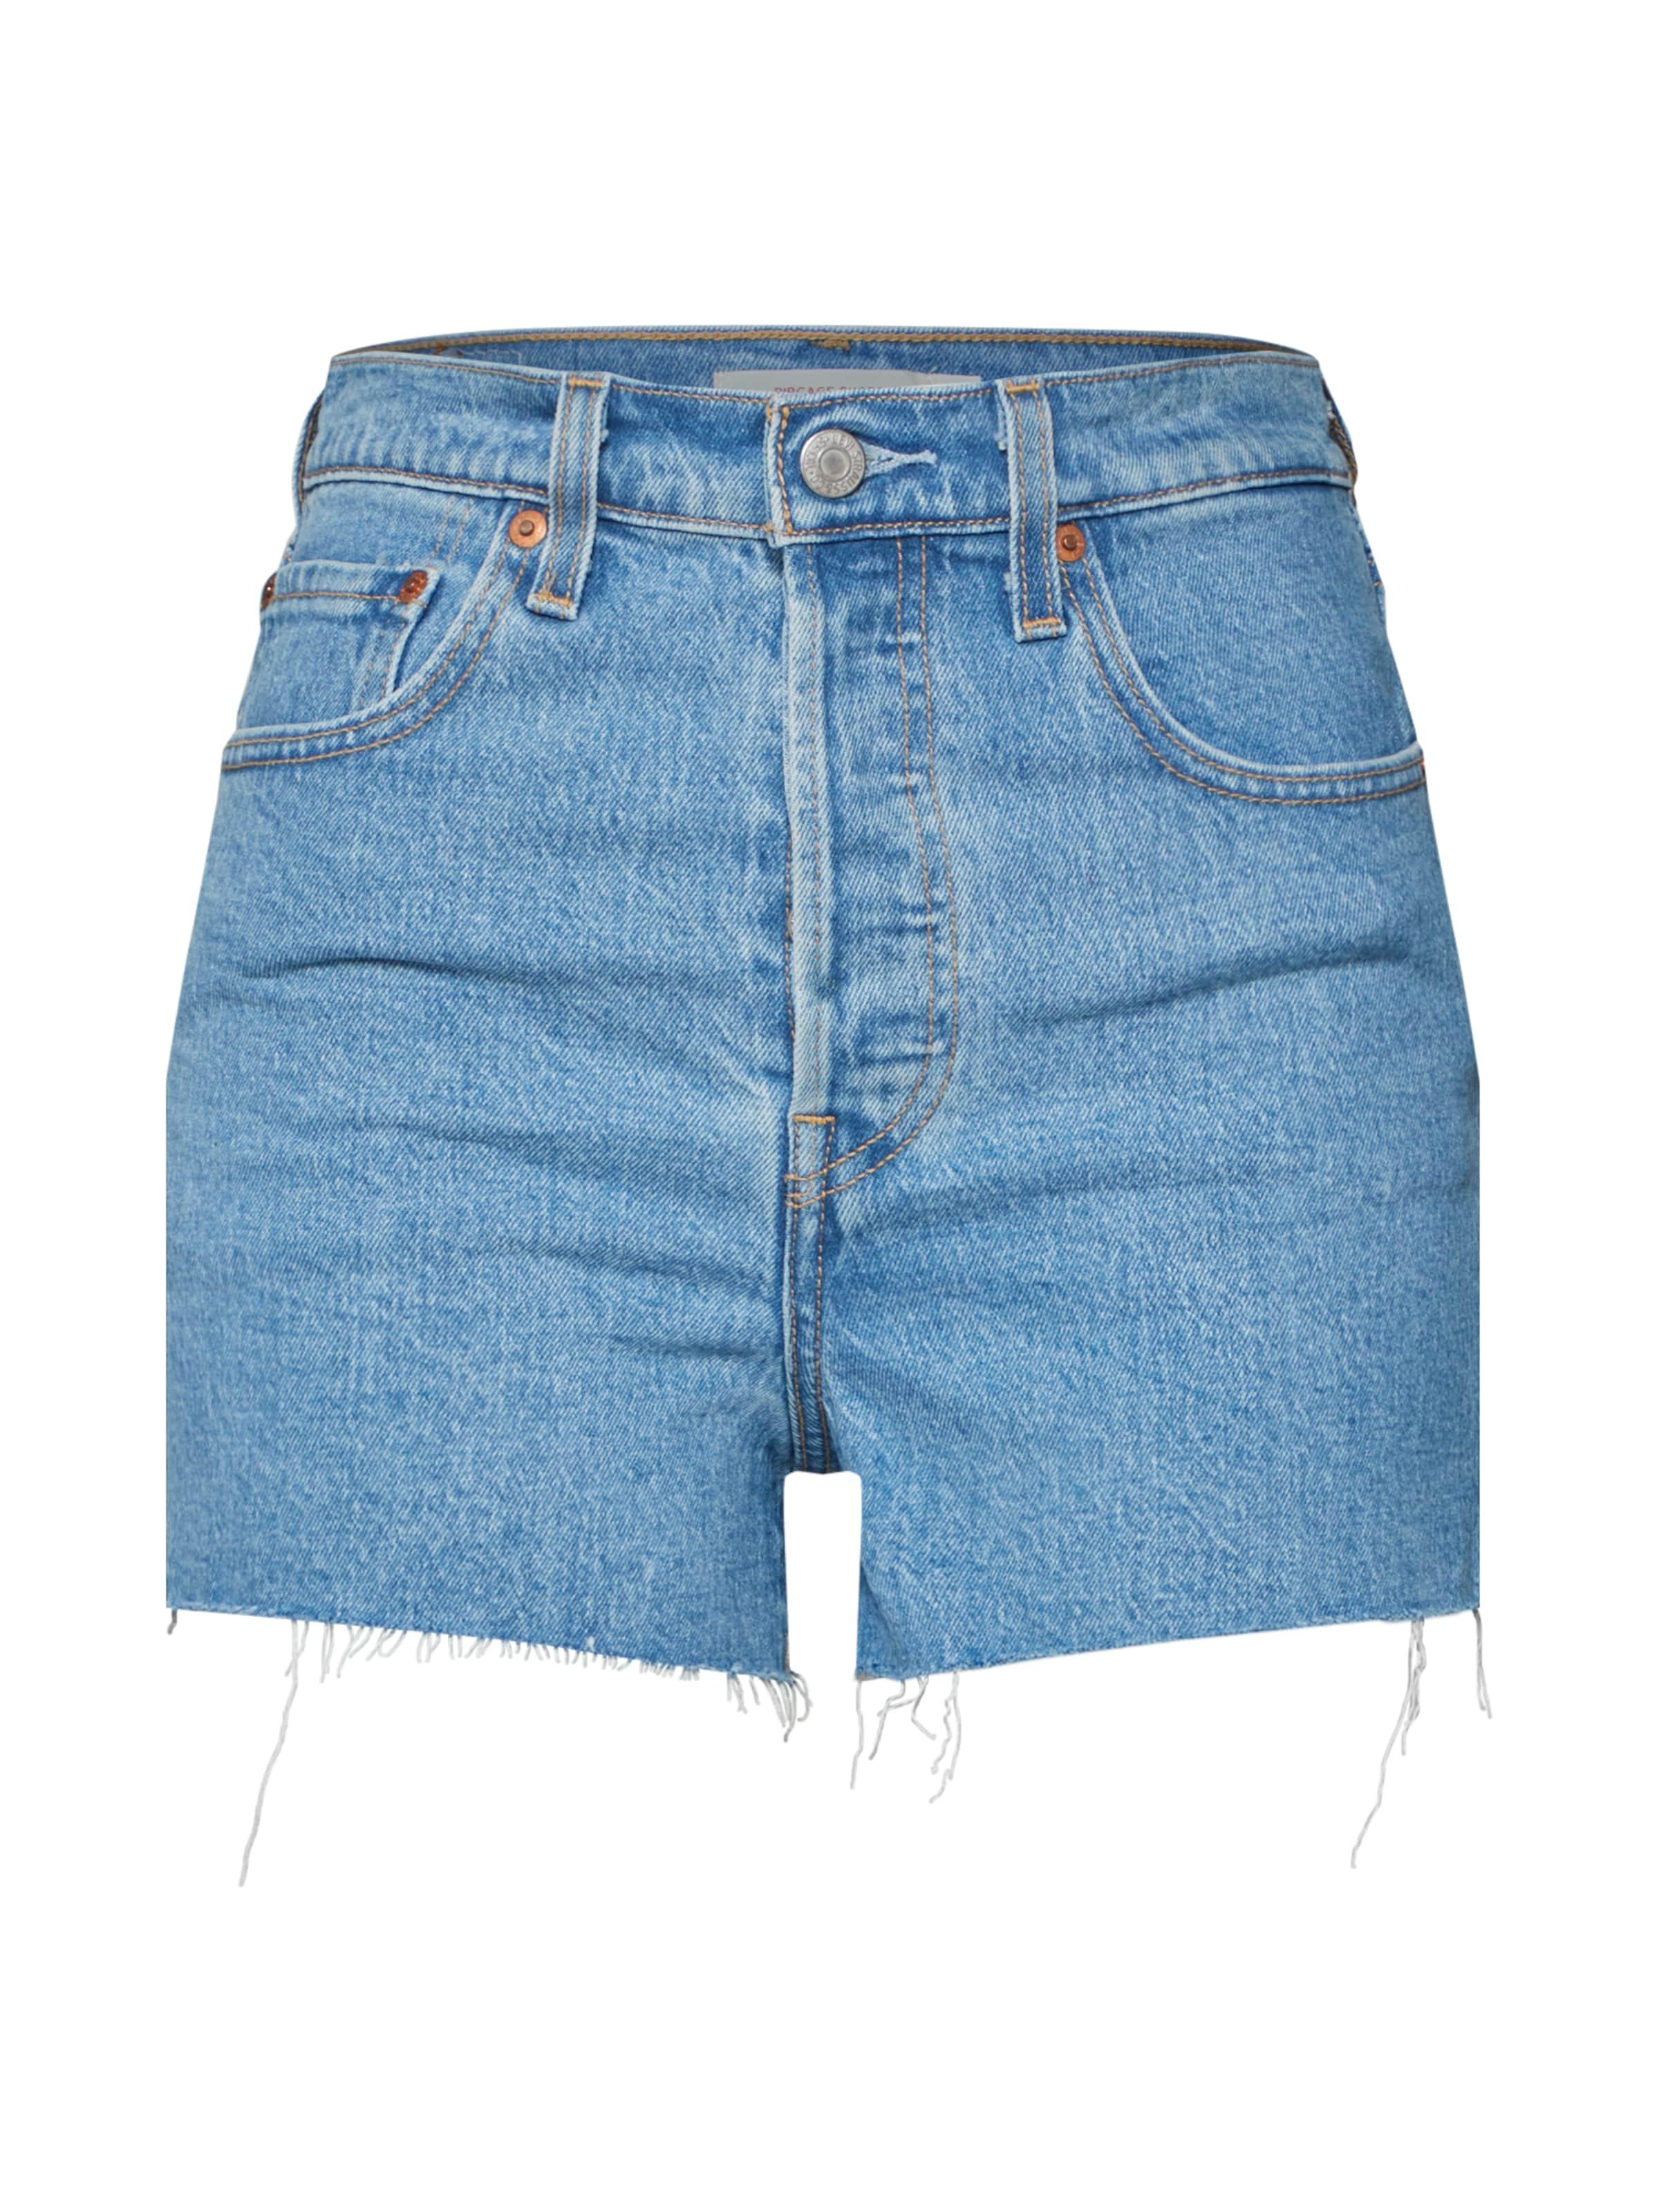 In Levi's 'ribcage' Denim Blue Shorts TlKu15Jc3F